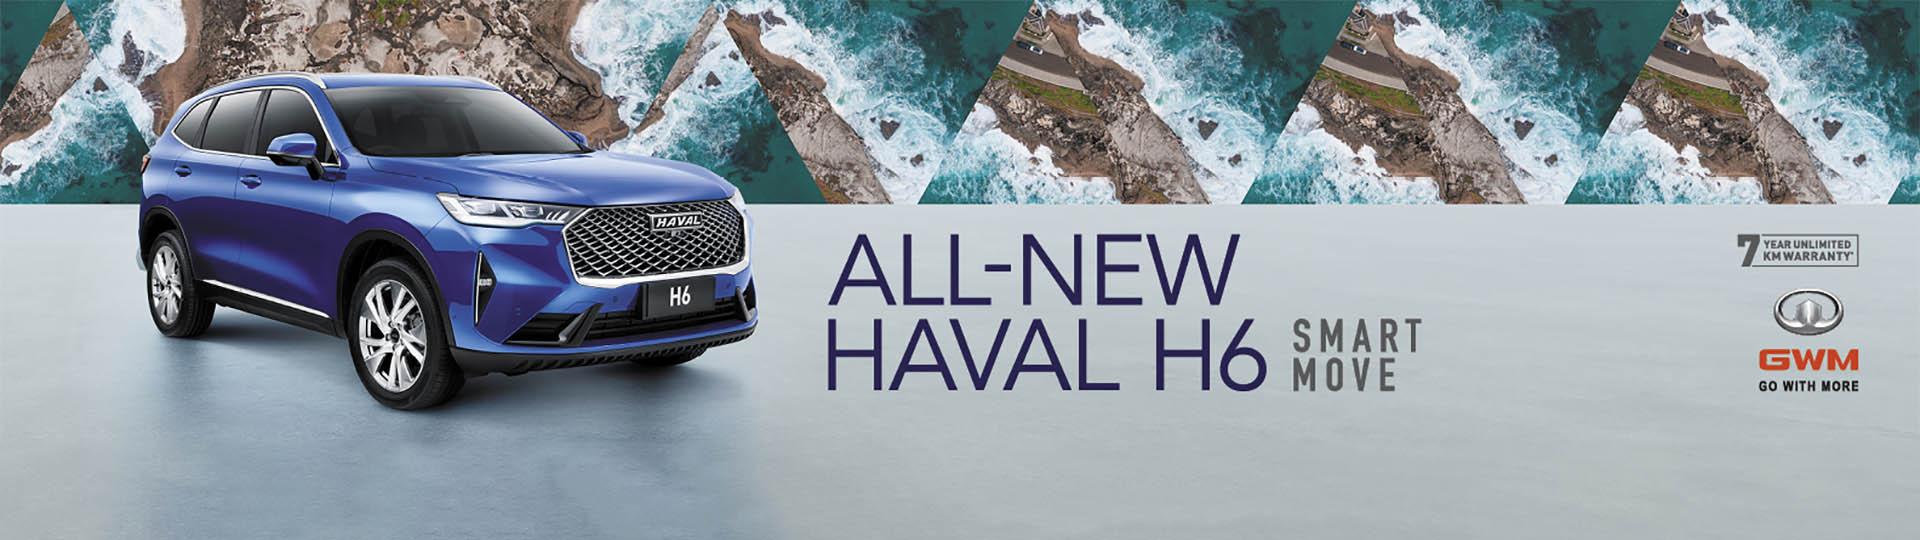 HAVAL - H6 banner